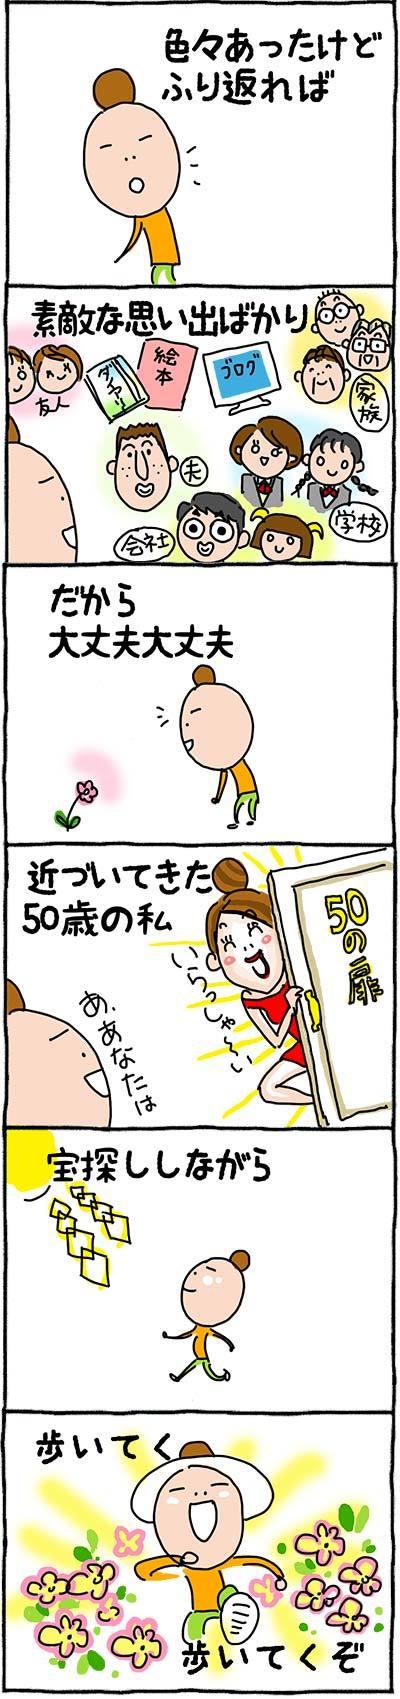 170707自己紹介06